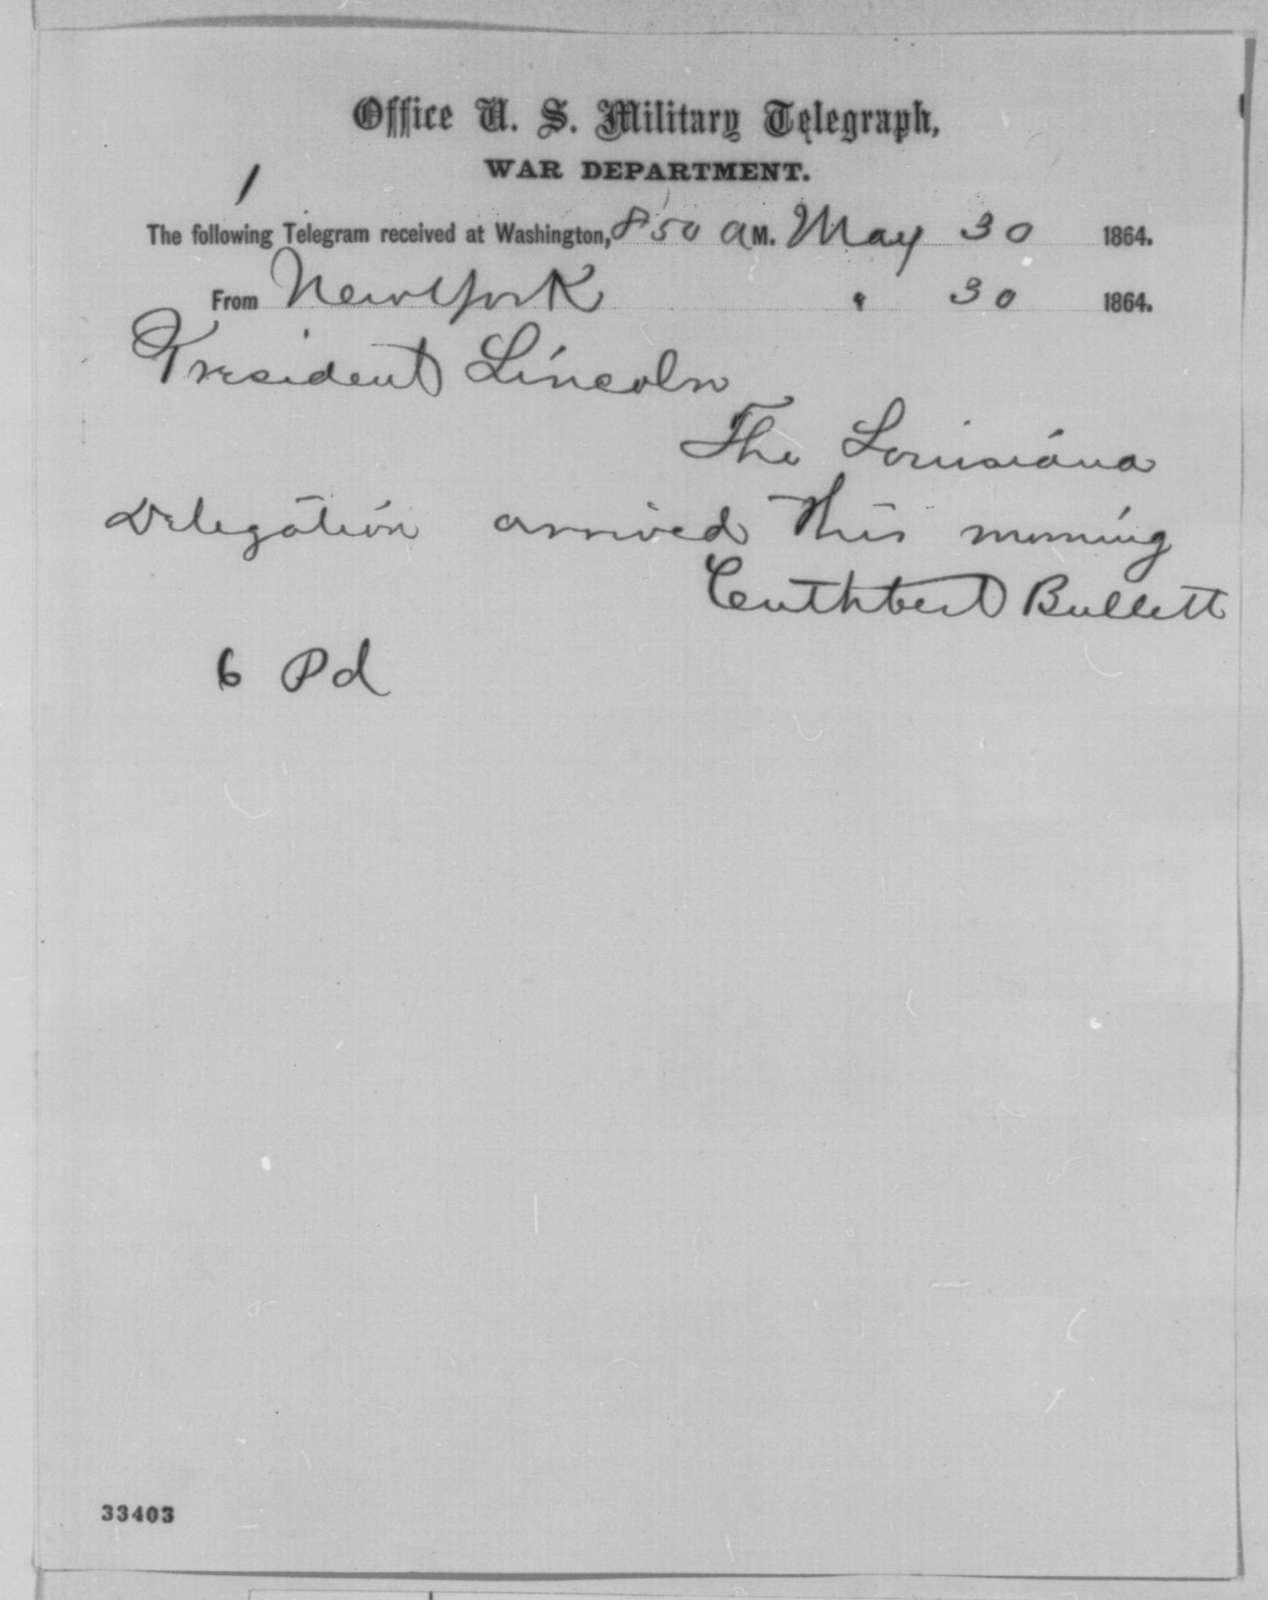 Cuthbert Bullitt to Abraham Lincoln, Monday, May 30, 1864  (Telegram reporting arrival of Louisiana delegation at New York)